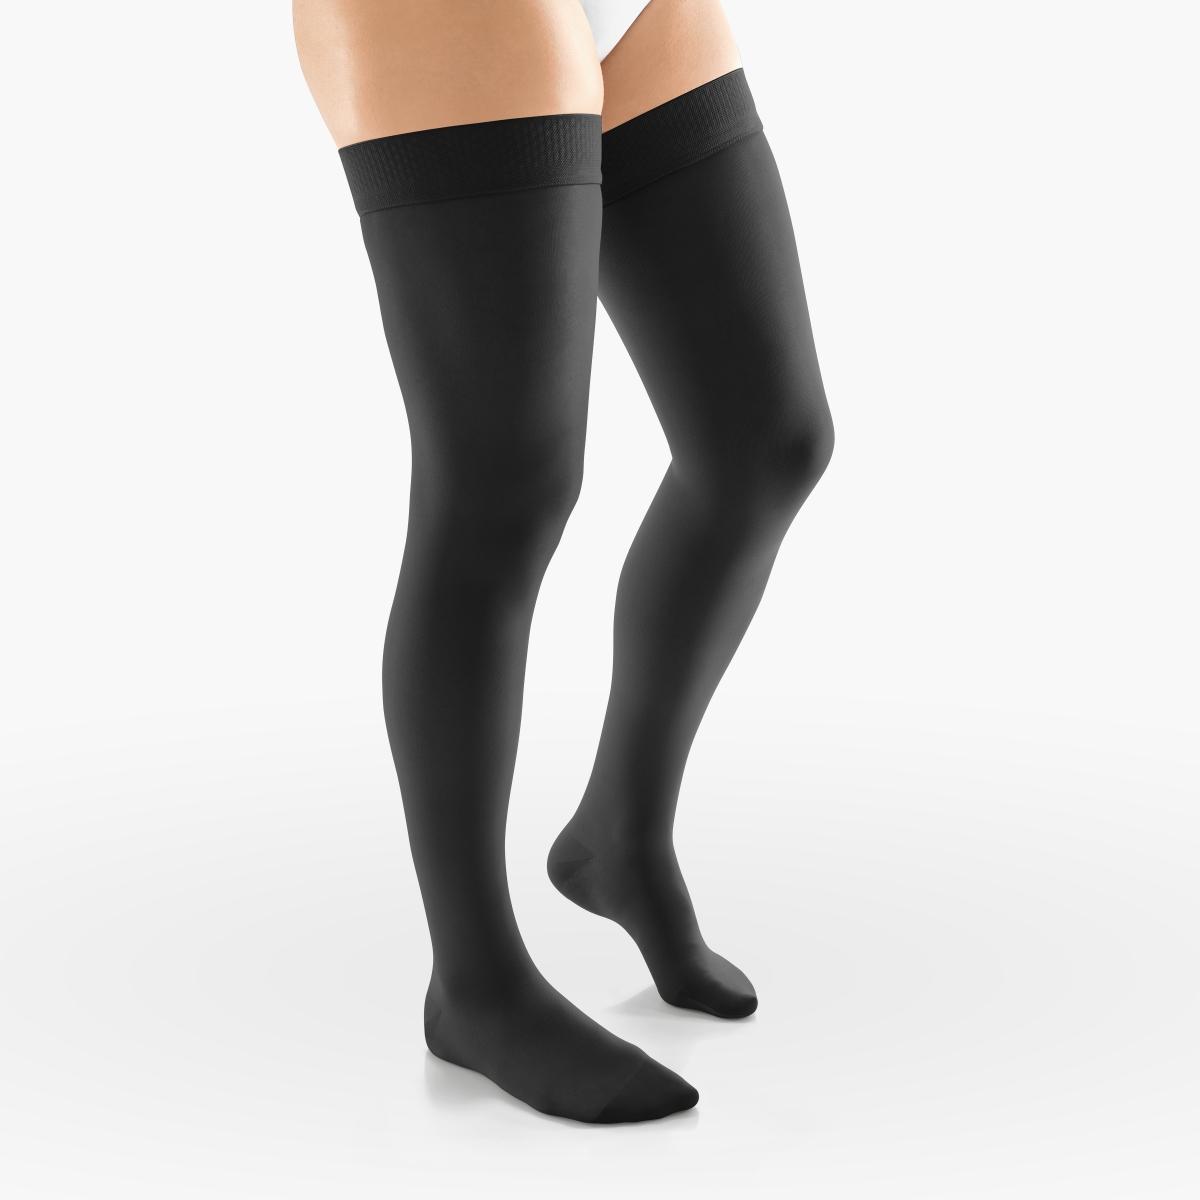 VENOSAN Sheer Secrets, Thigh High 15-20, Classic black, S, Closed Toe Moderate 15-20 mmHg | Classic black | S |  | Closed Toe | Knit Top